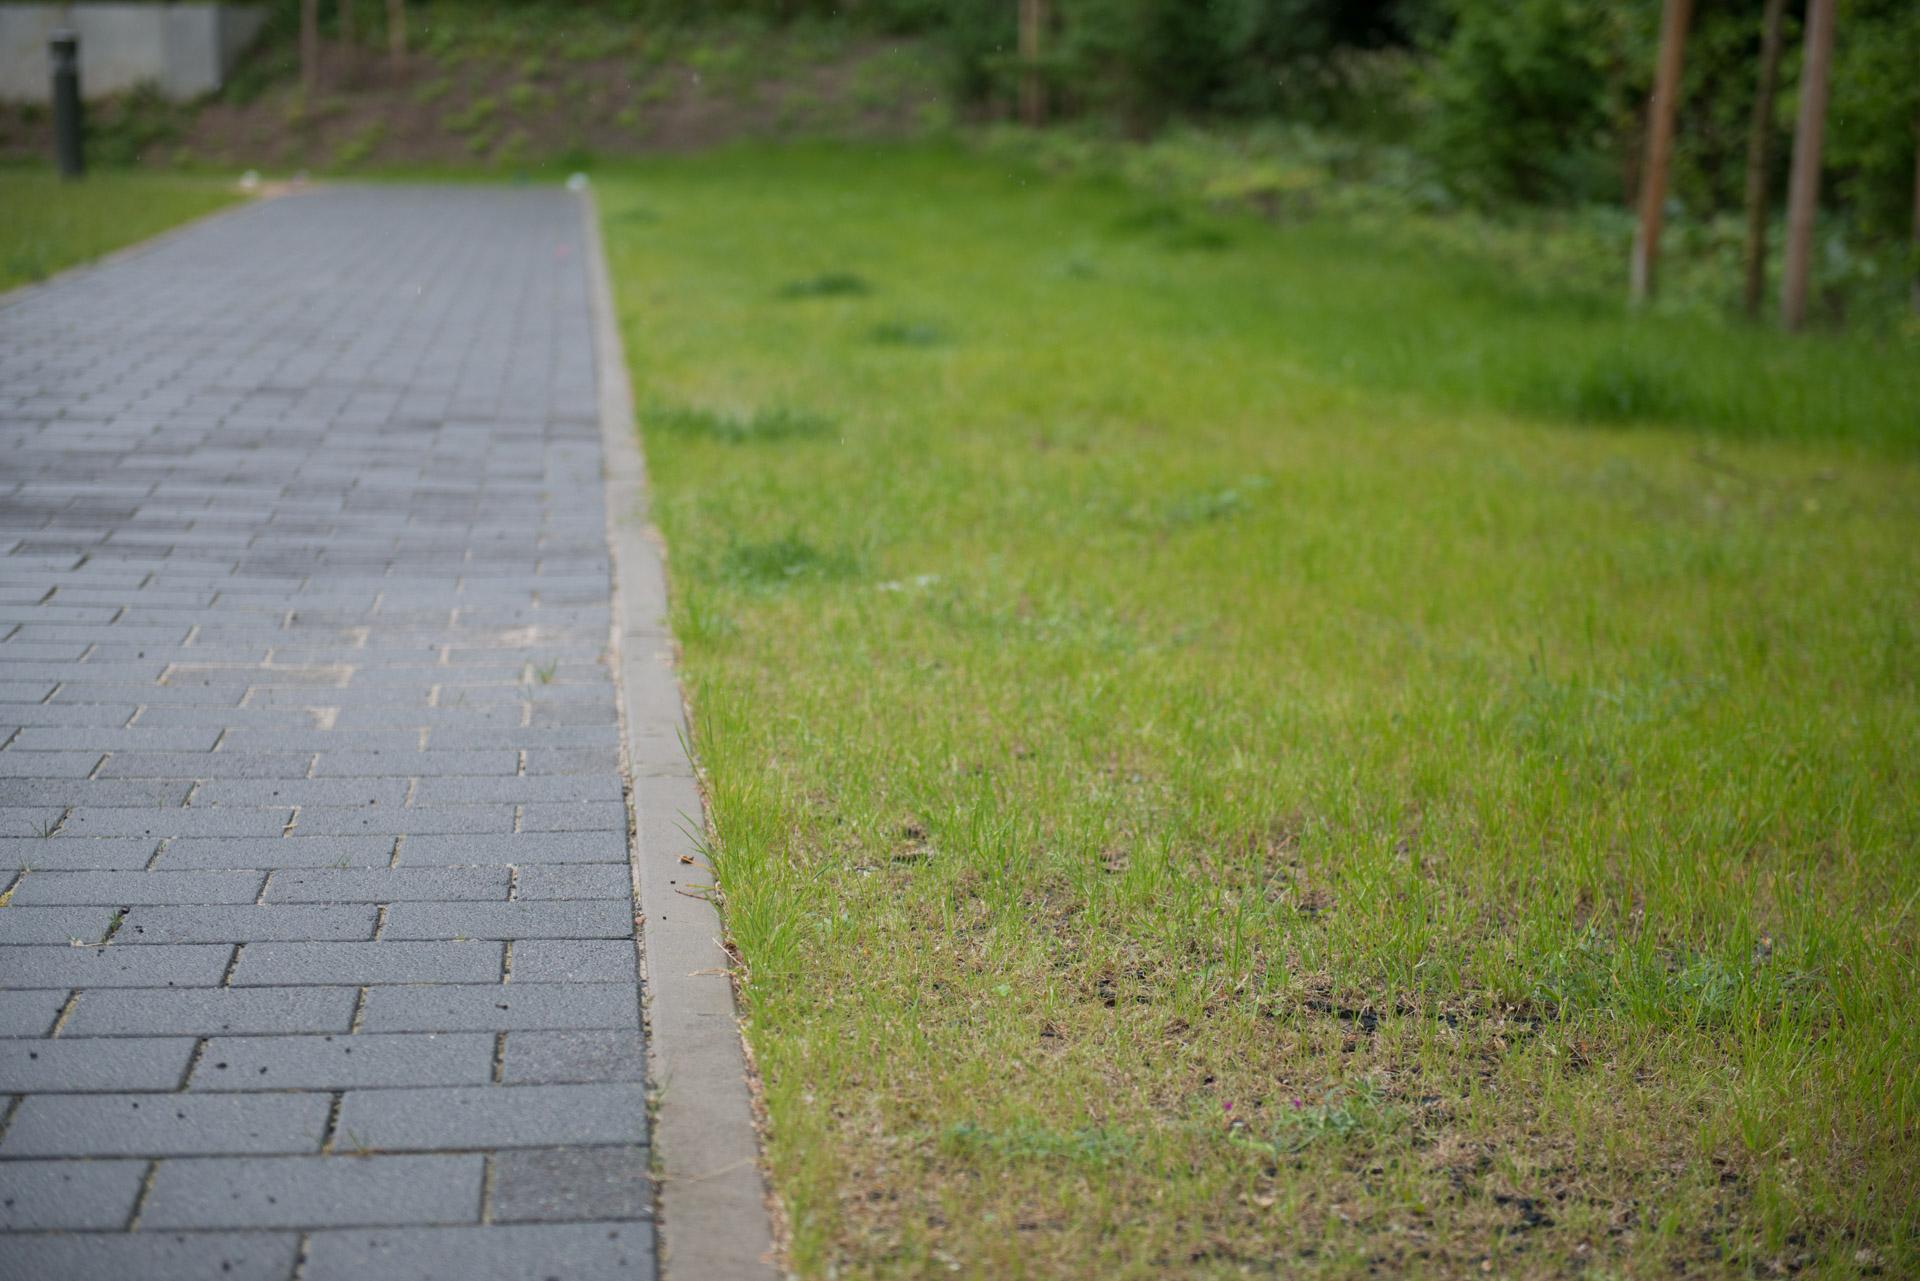 Rasengitter neben einem Weg